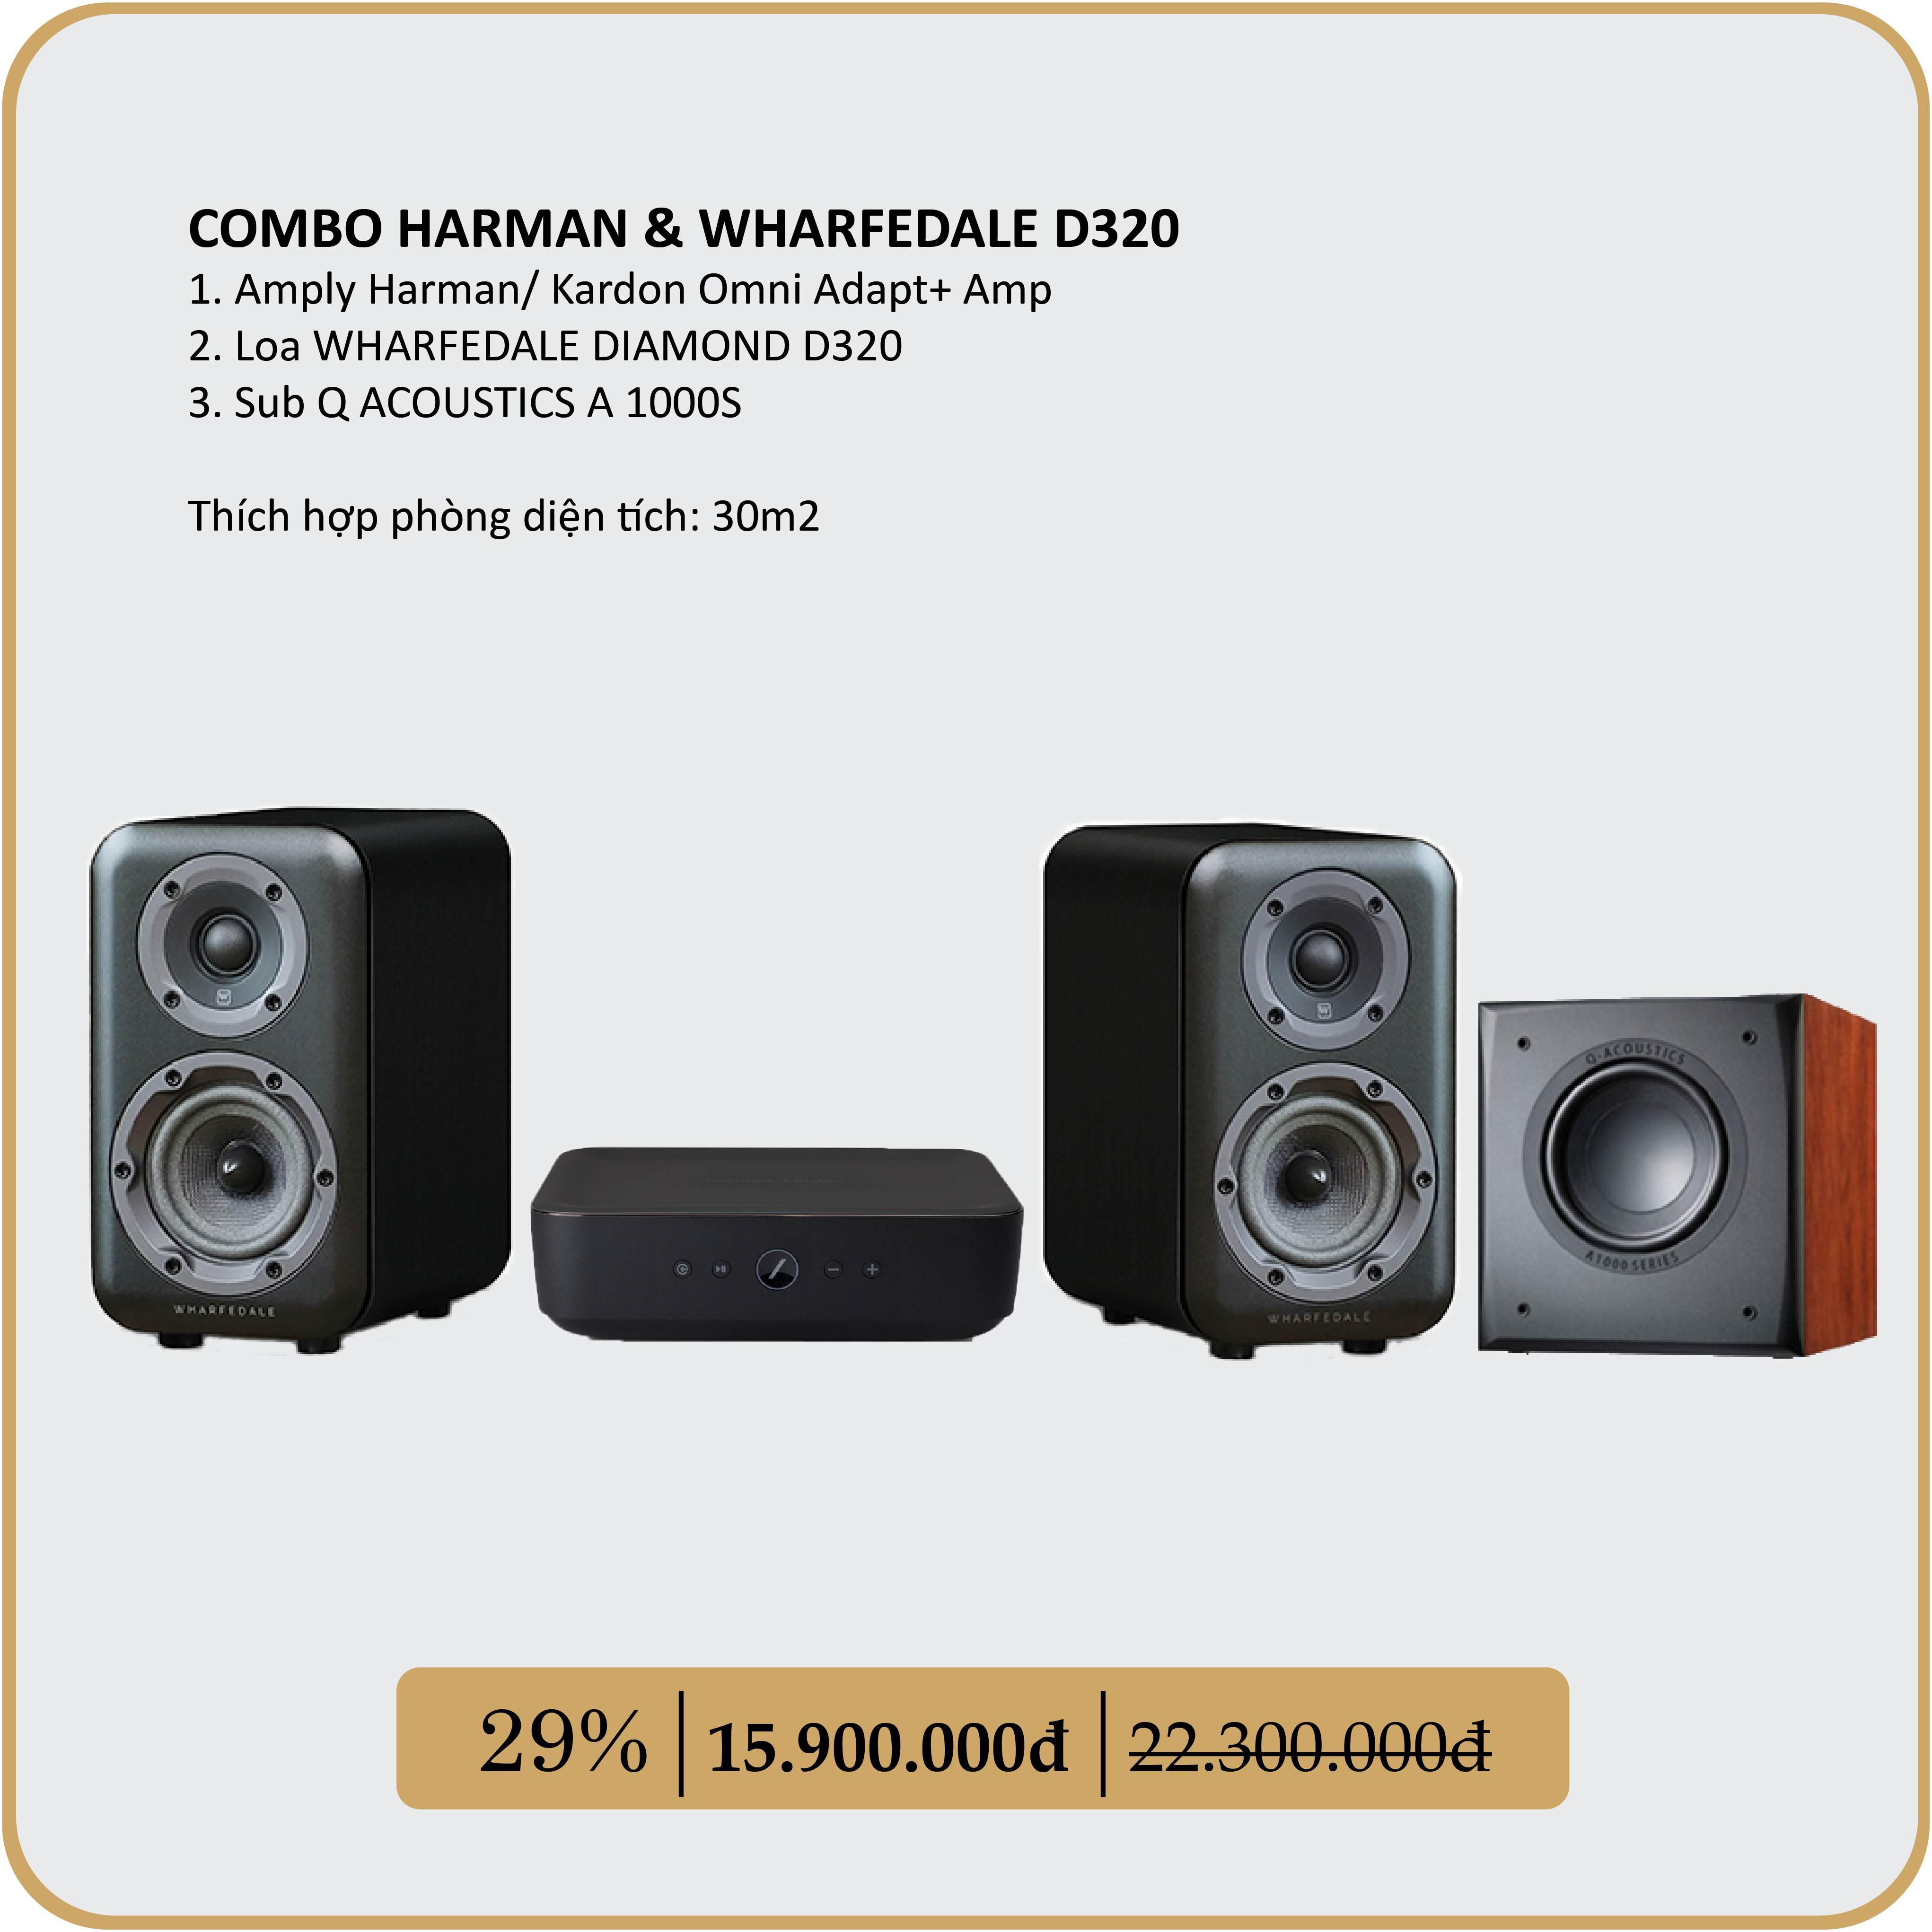 COMBO HARMAN & WHARFEDALE D320